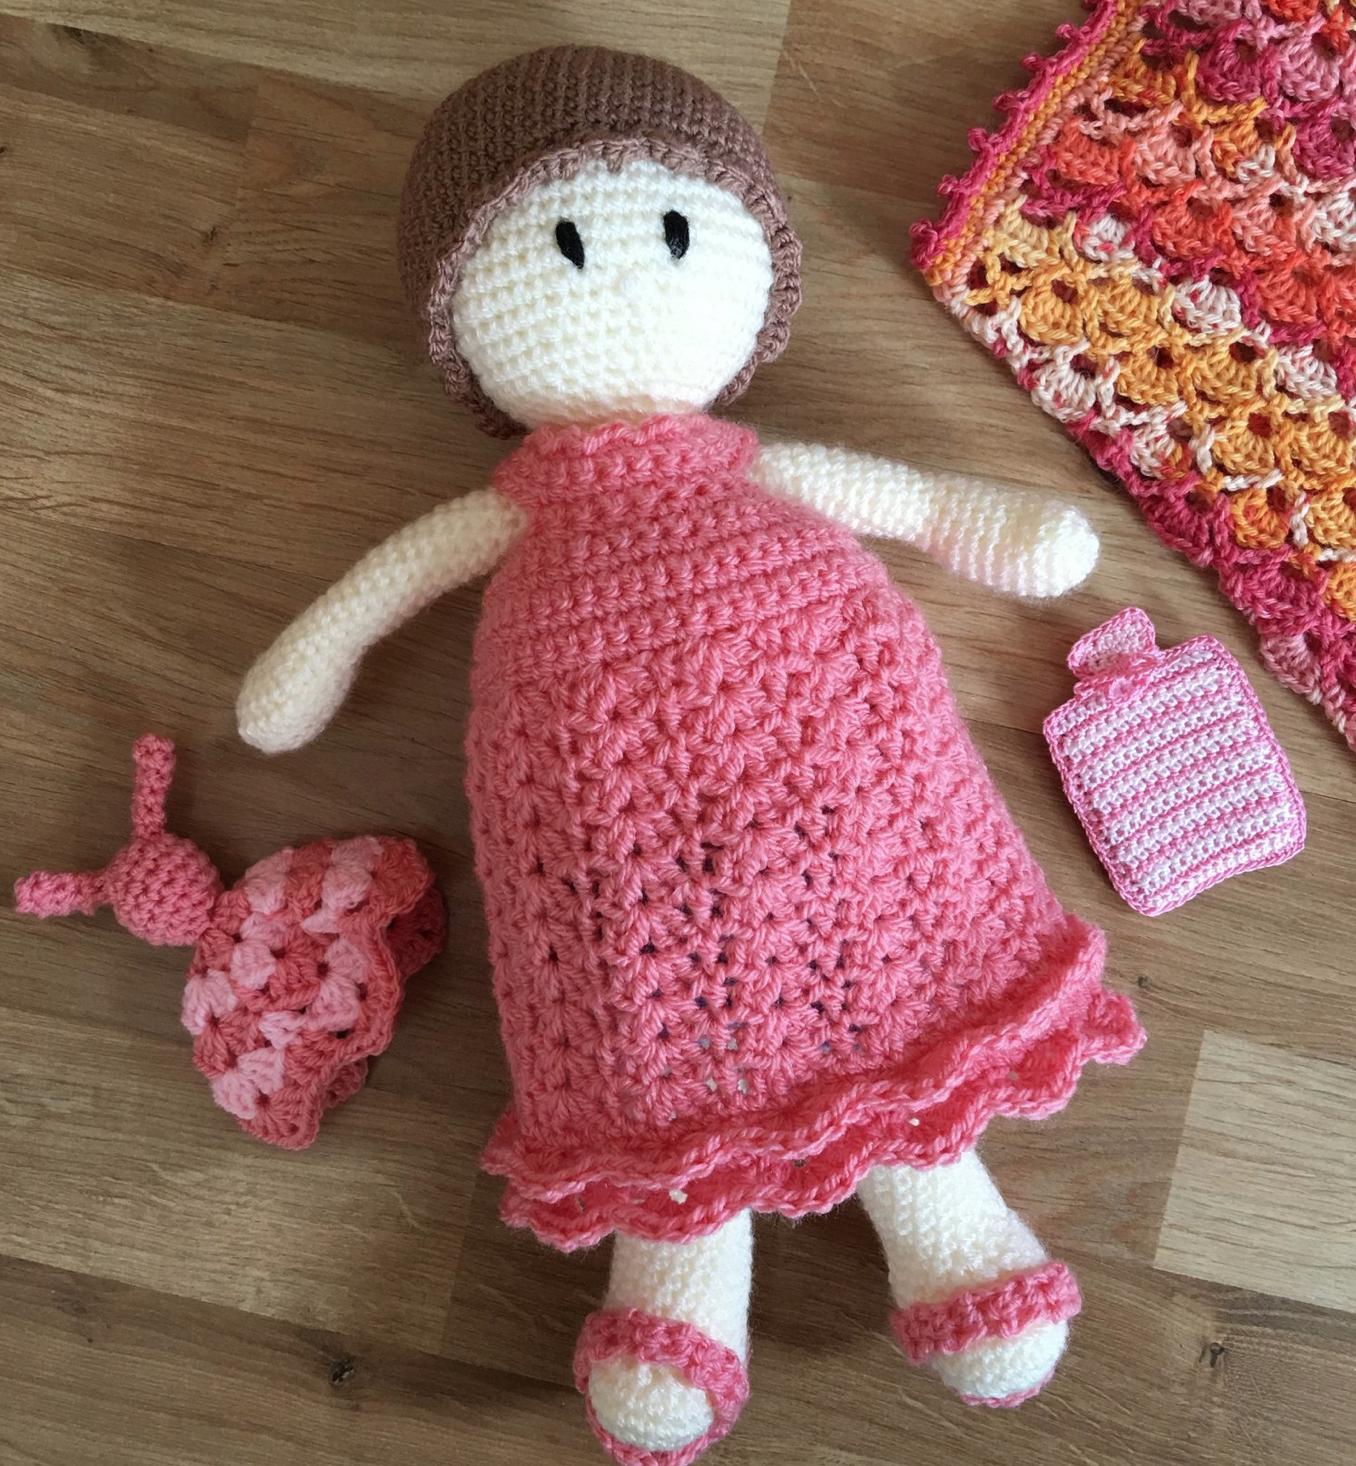 Bedtime for Florence Elizabeth - PDF Crochet Pattern (doll pattern not included)